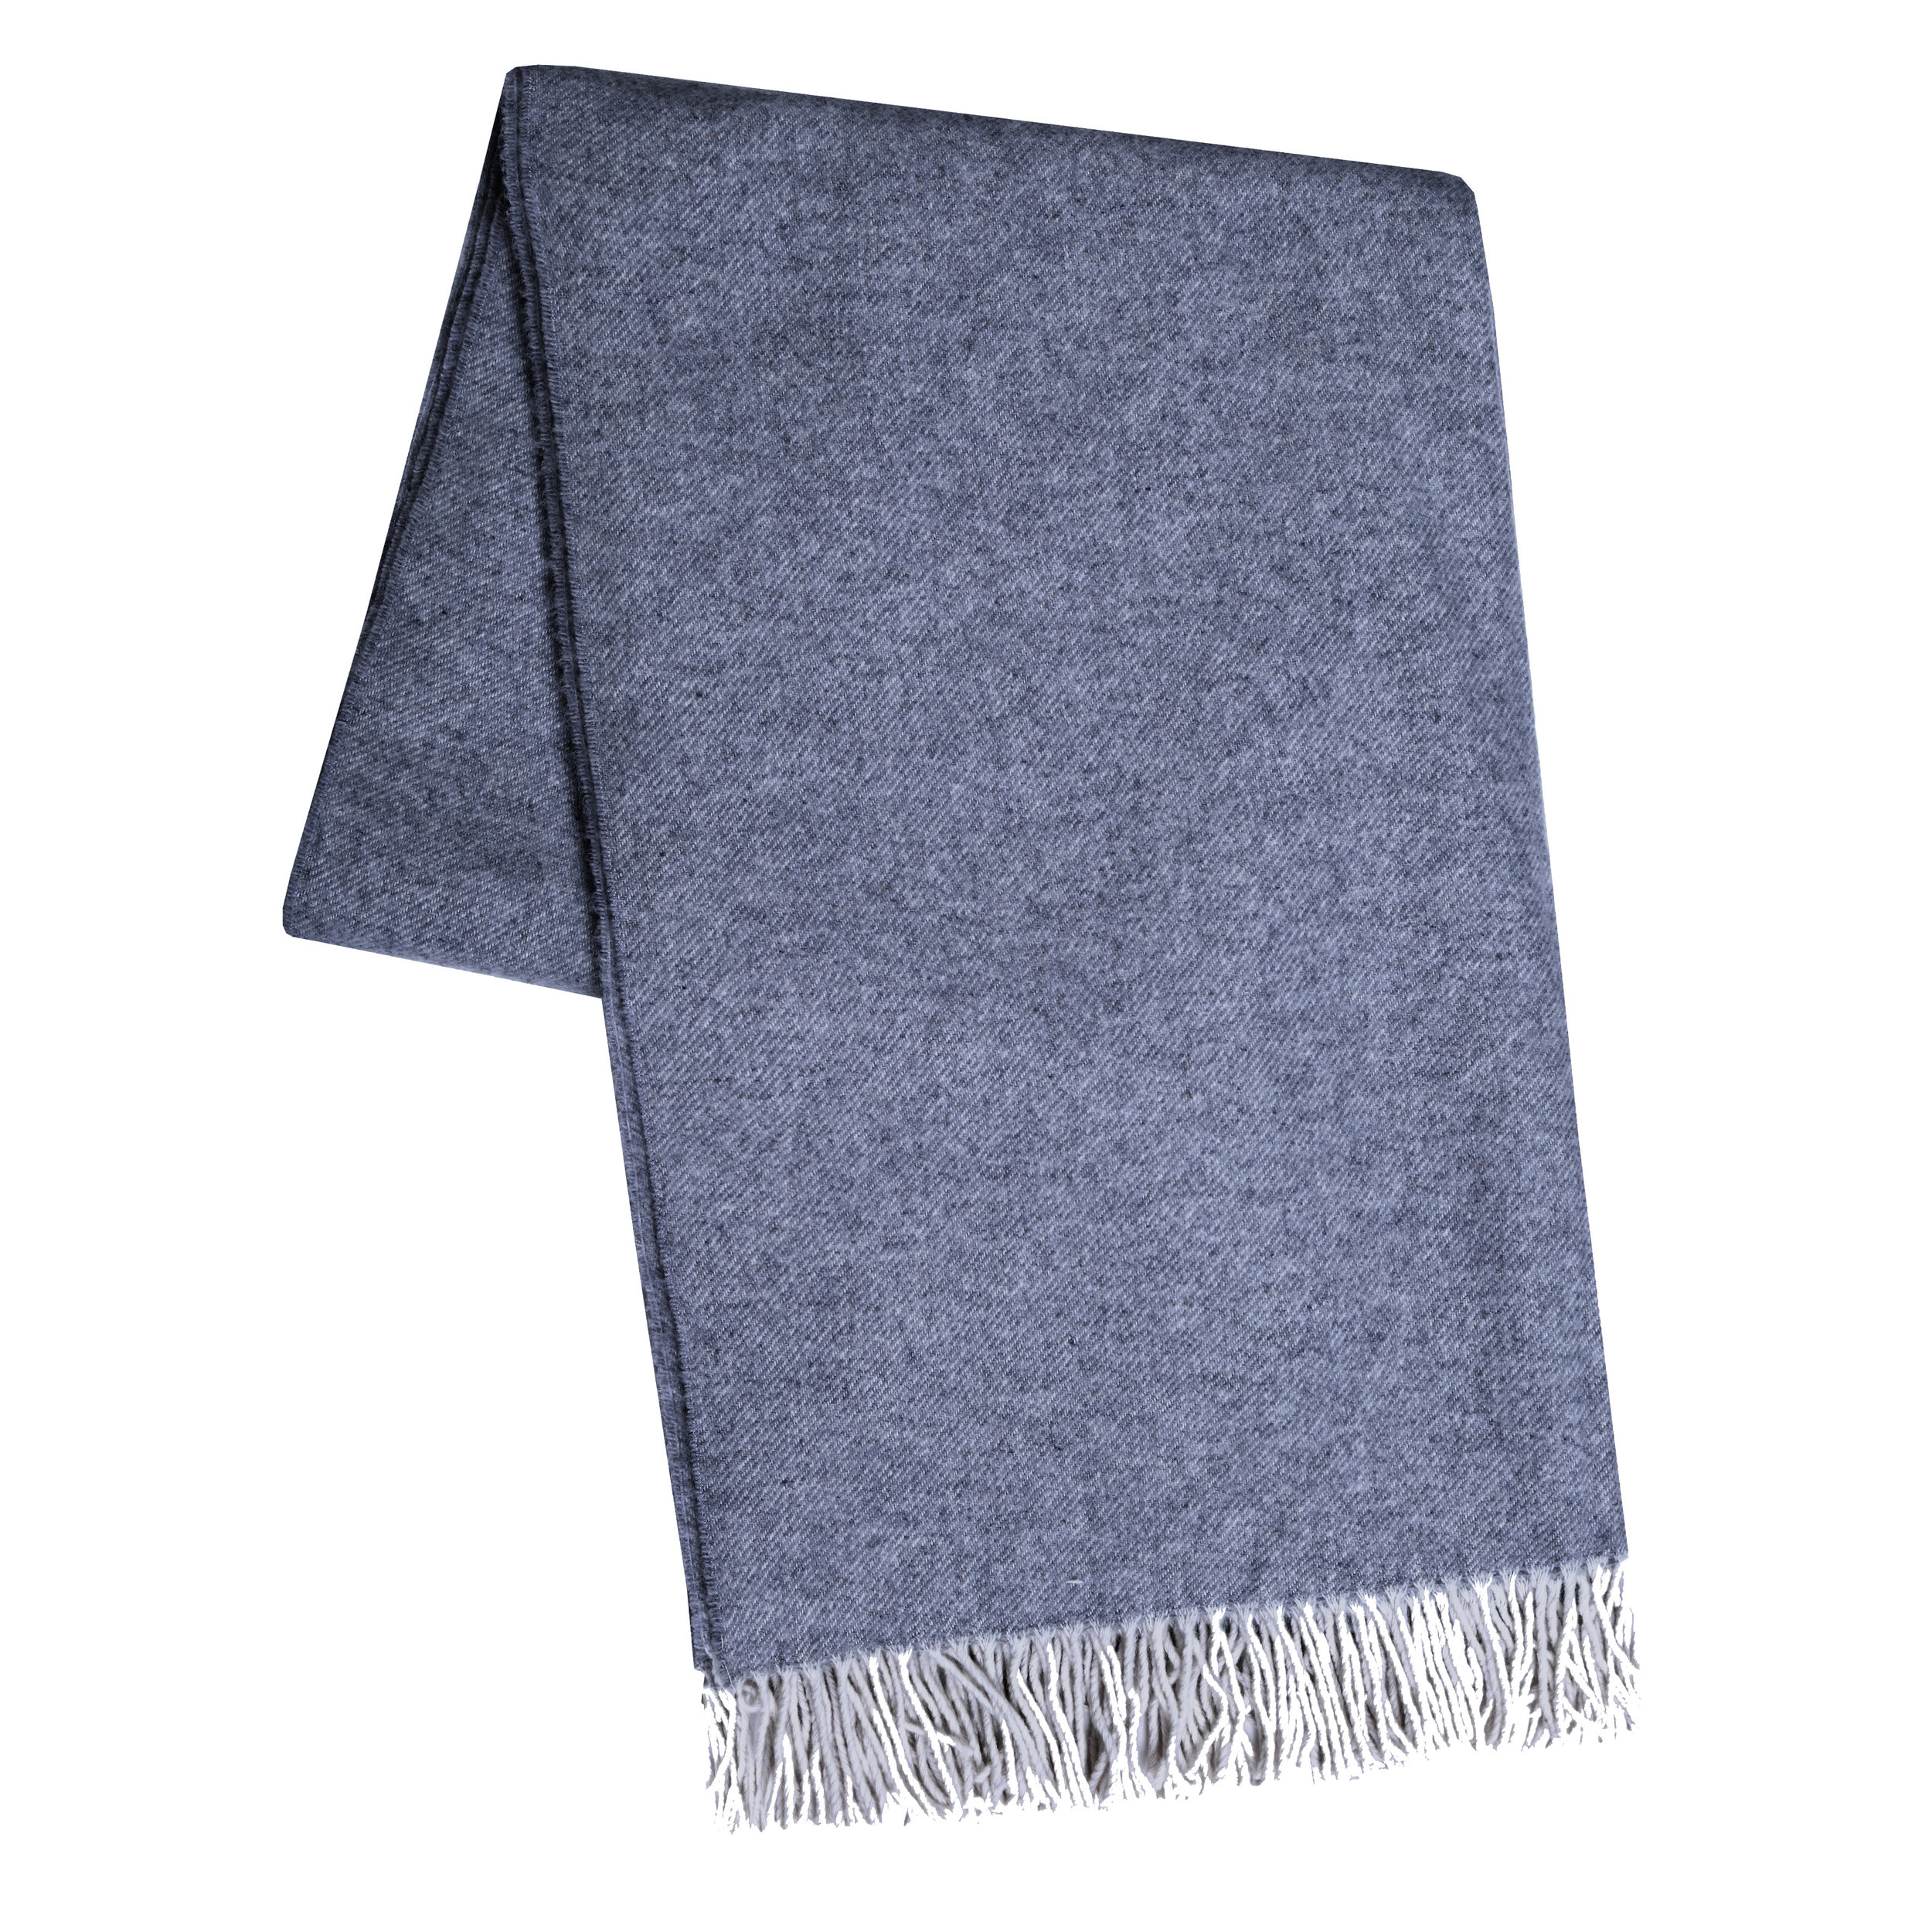 HUUMA - torkkupeitto   130 x 170 cm, 45 % Wool, 30 % Acrylic, 20 % Pes, 5 % Cashmere   69,95 €